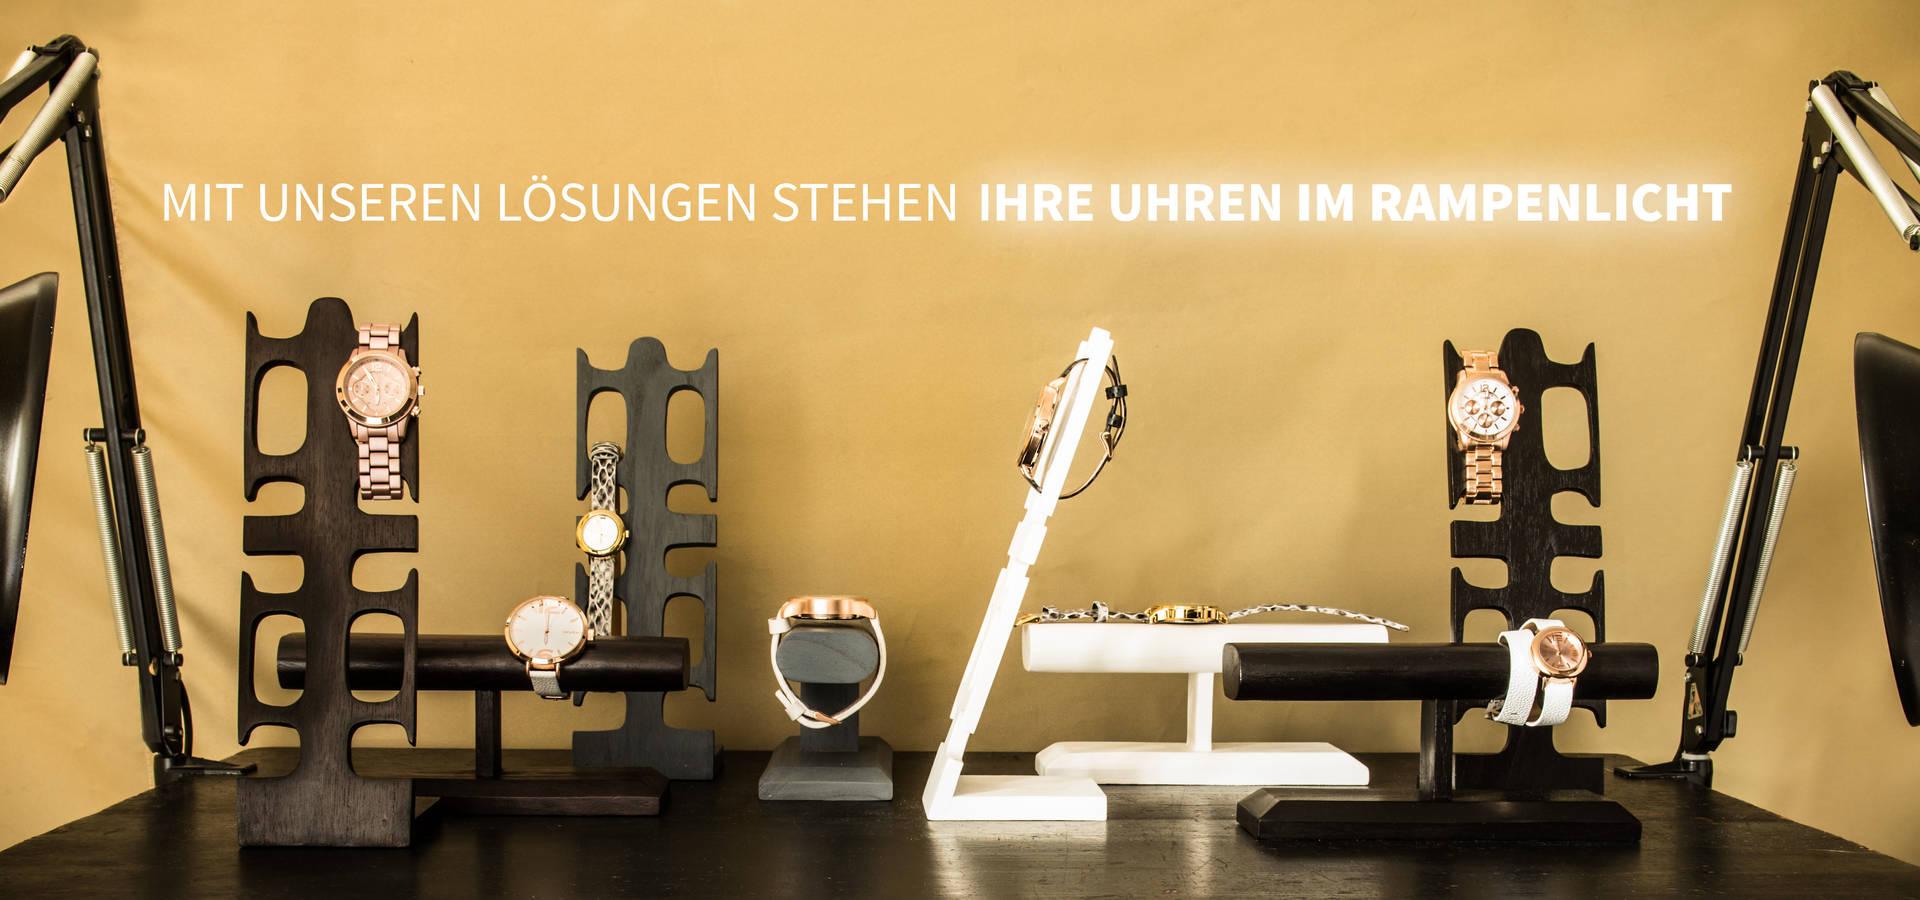 alkita gmbh m bel accessoires in aachen homify. Black Bedroom Furniture Sets. Home Design Ideas